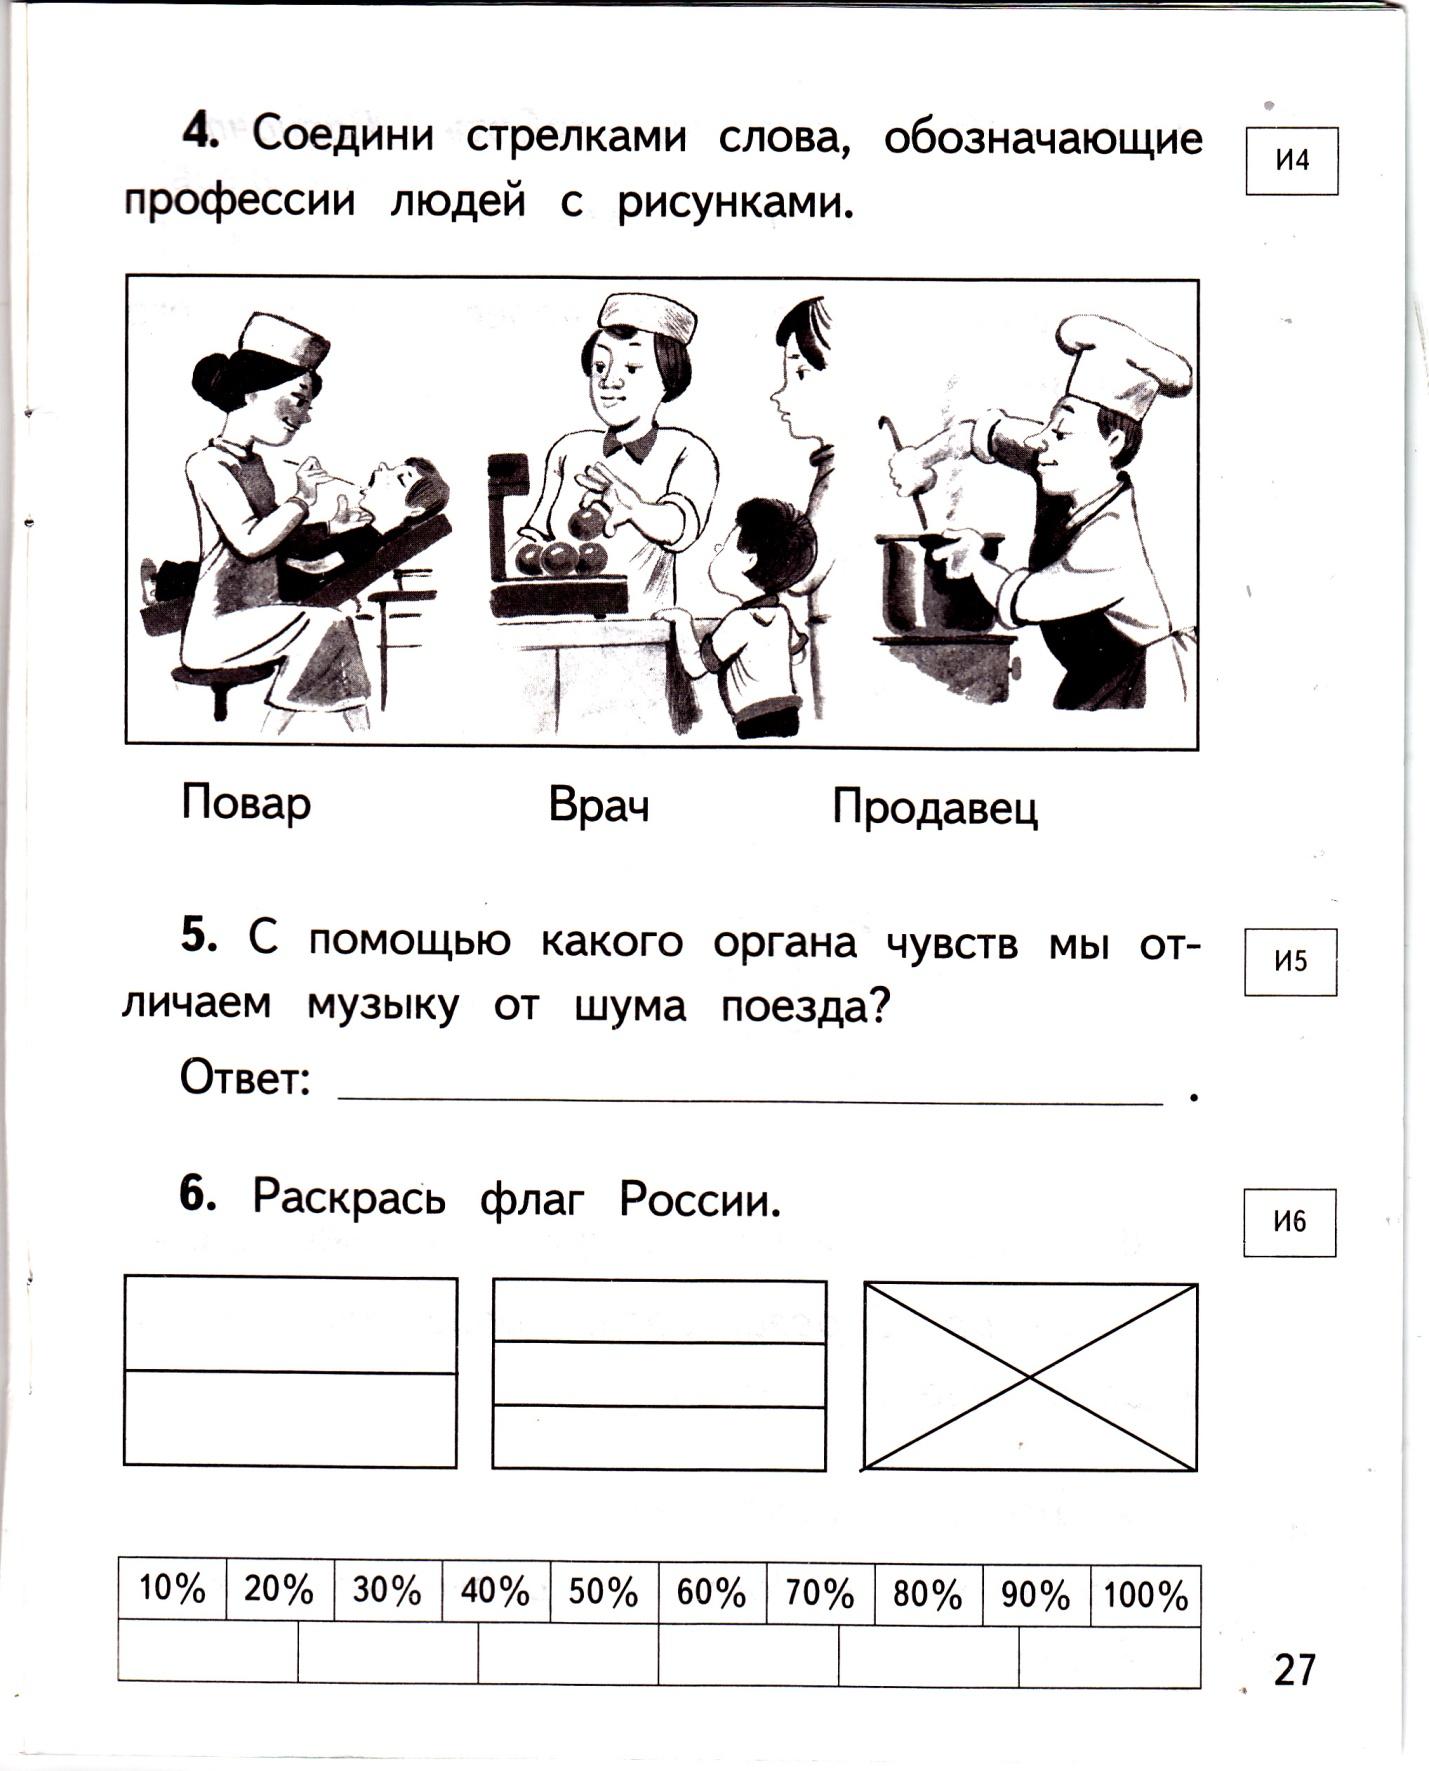 C:\Users\МБОУ СОШ № 4\Desktop\для Жуковой С.Н\IMG_0037.jpg